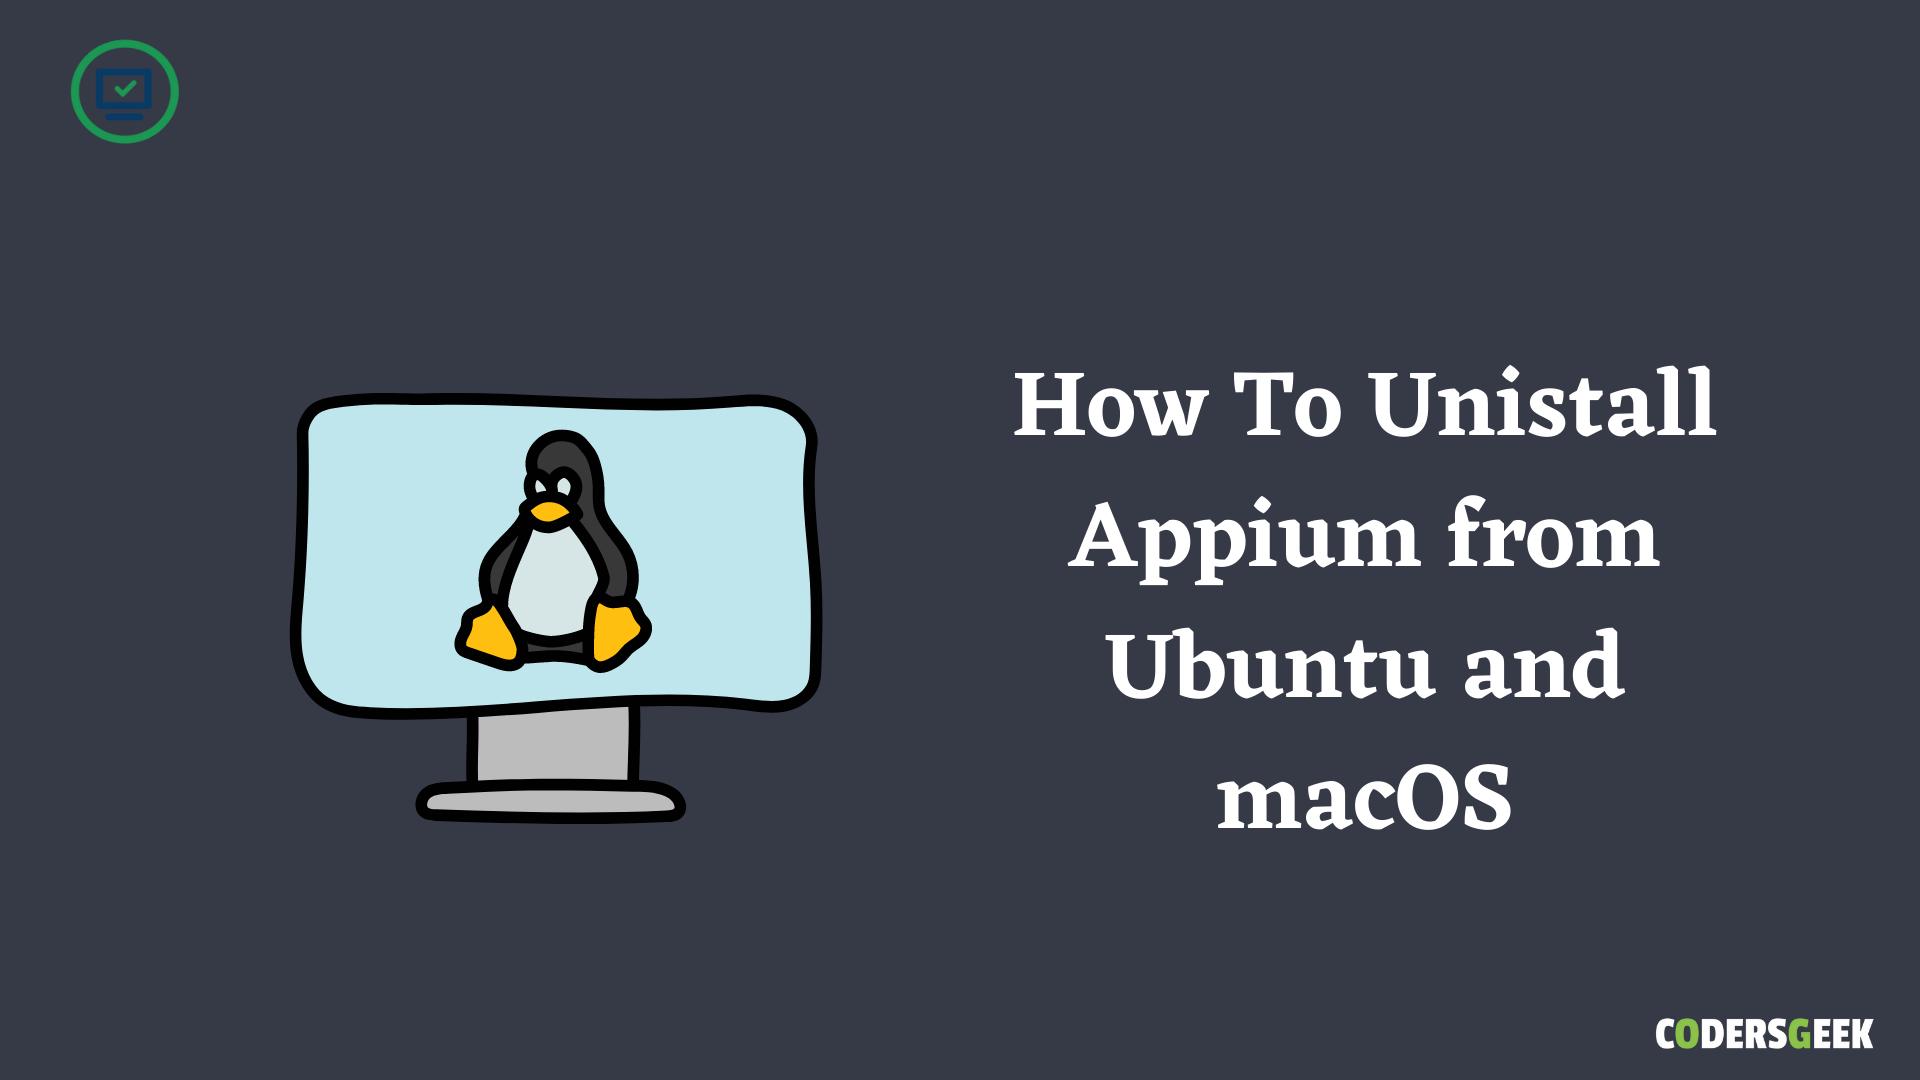 How To Uninstall Appium On Ubuntu